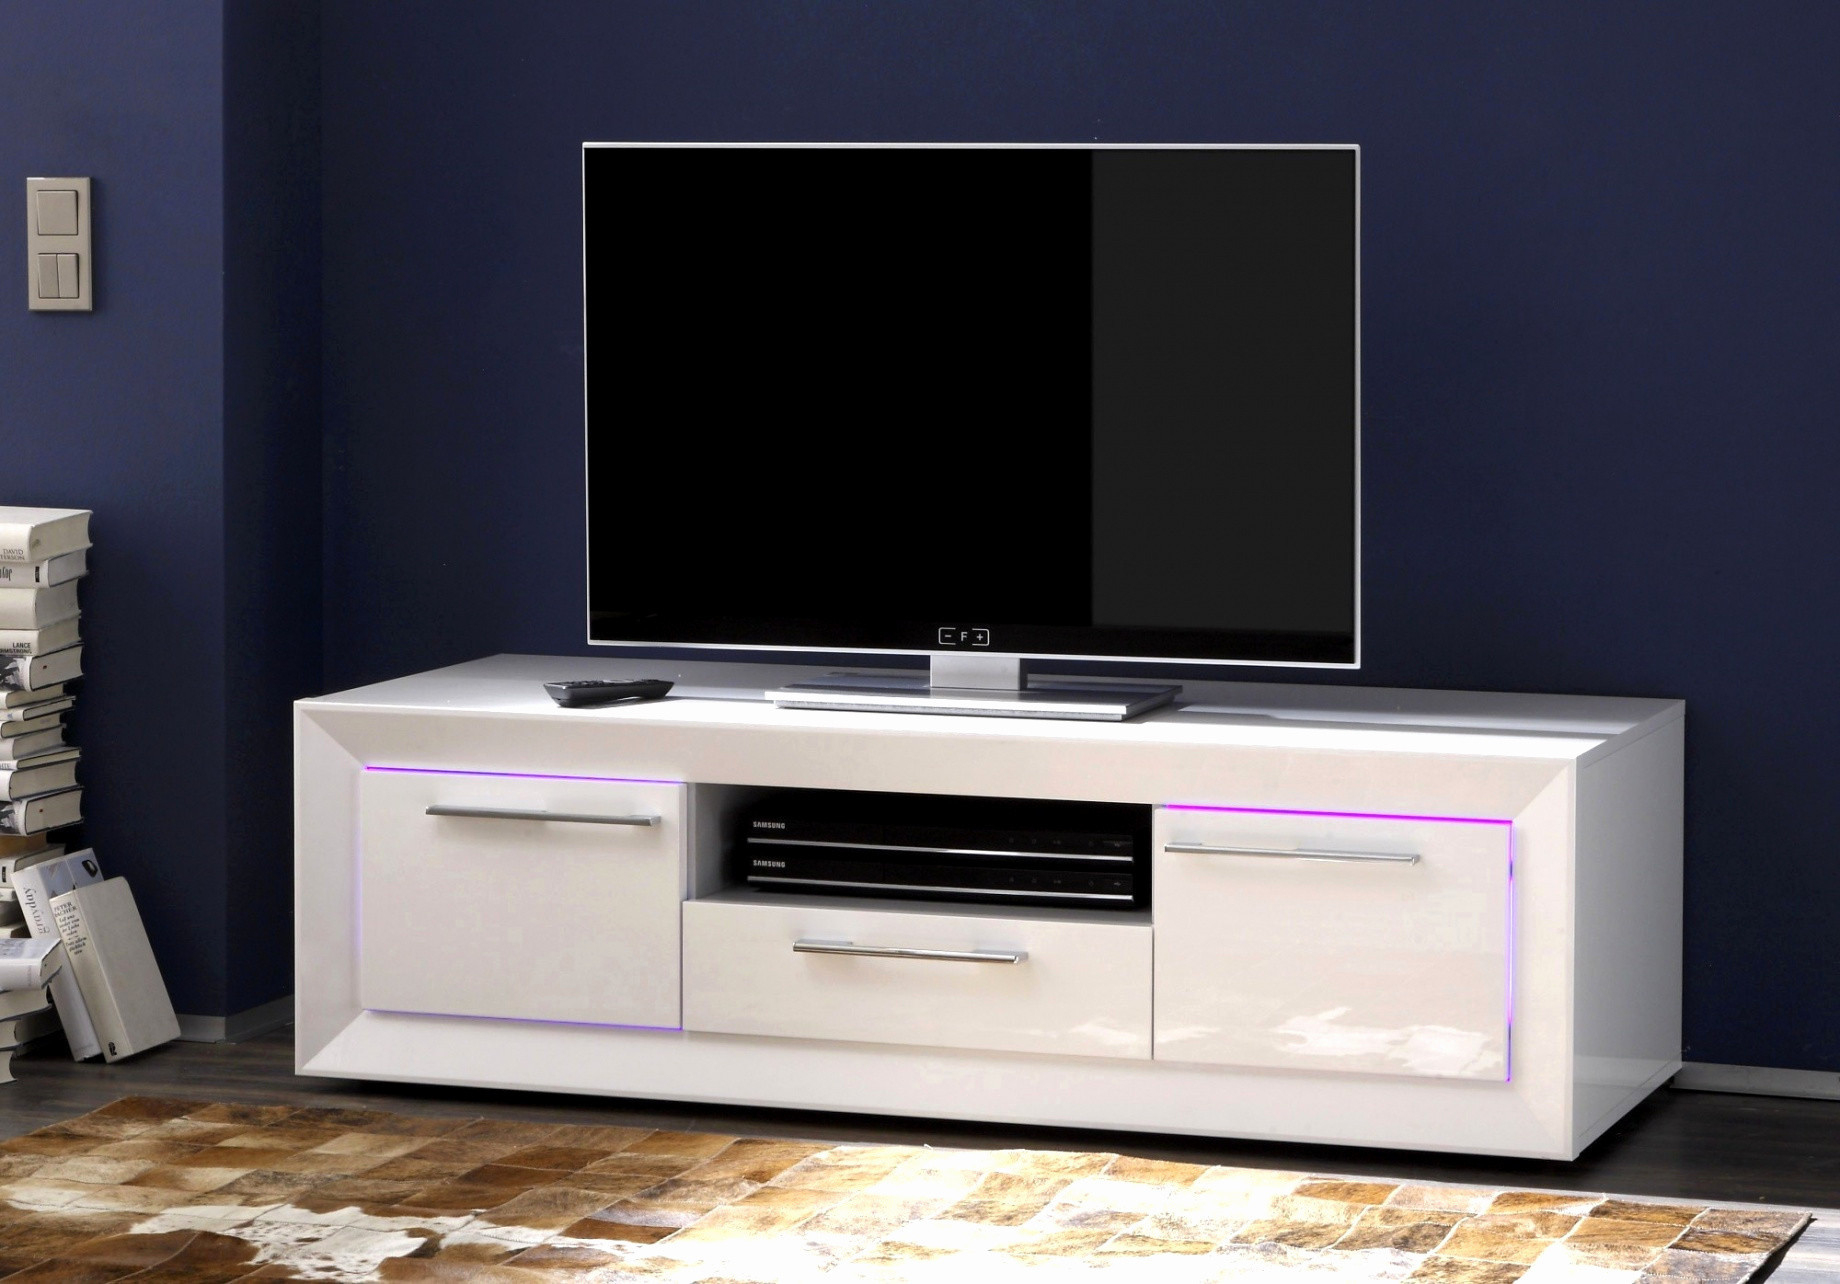 Destock Meubles Chinois Meuble Tv Orientable – Meubles Salon serapportantà Destock Meubles Chinois